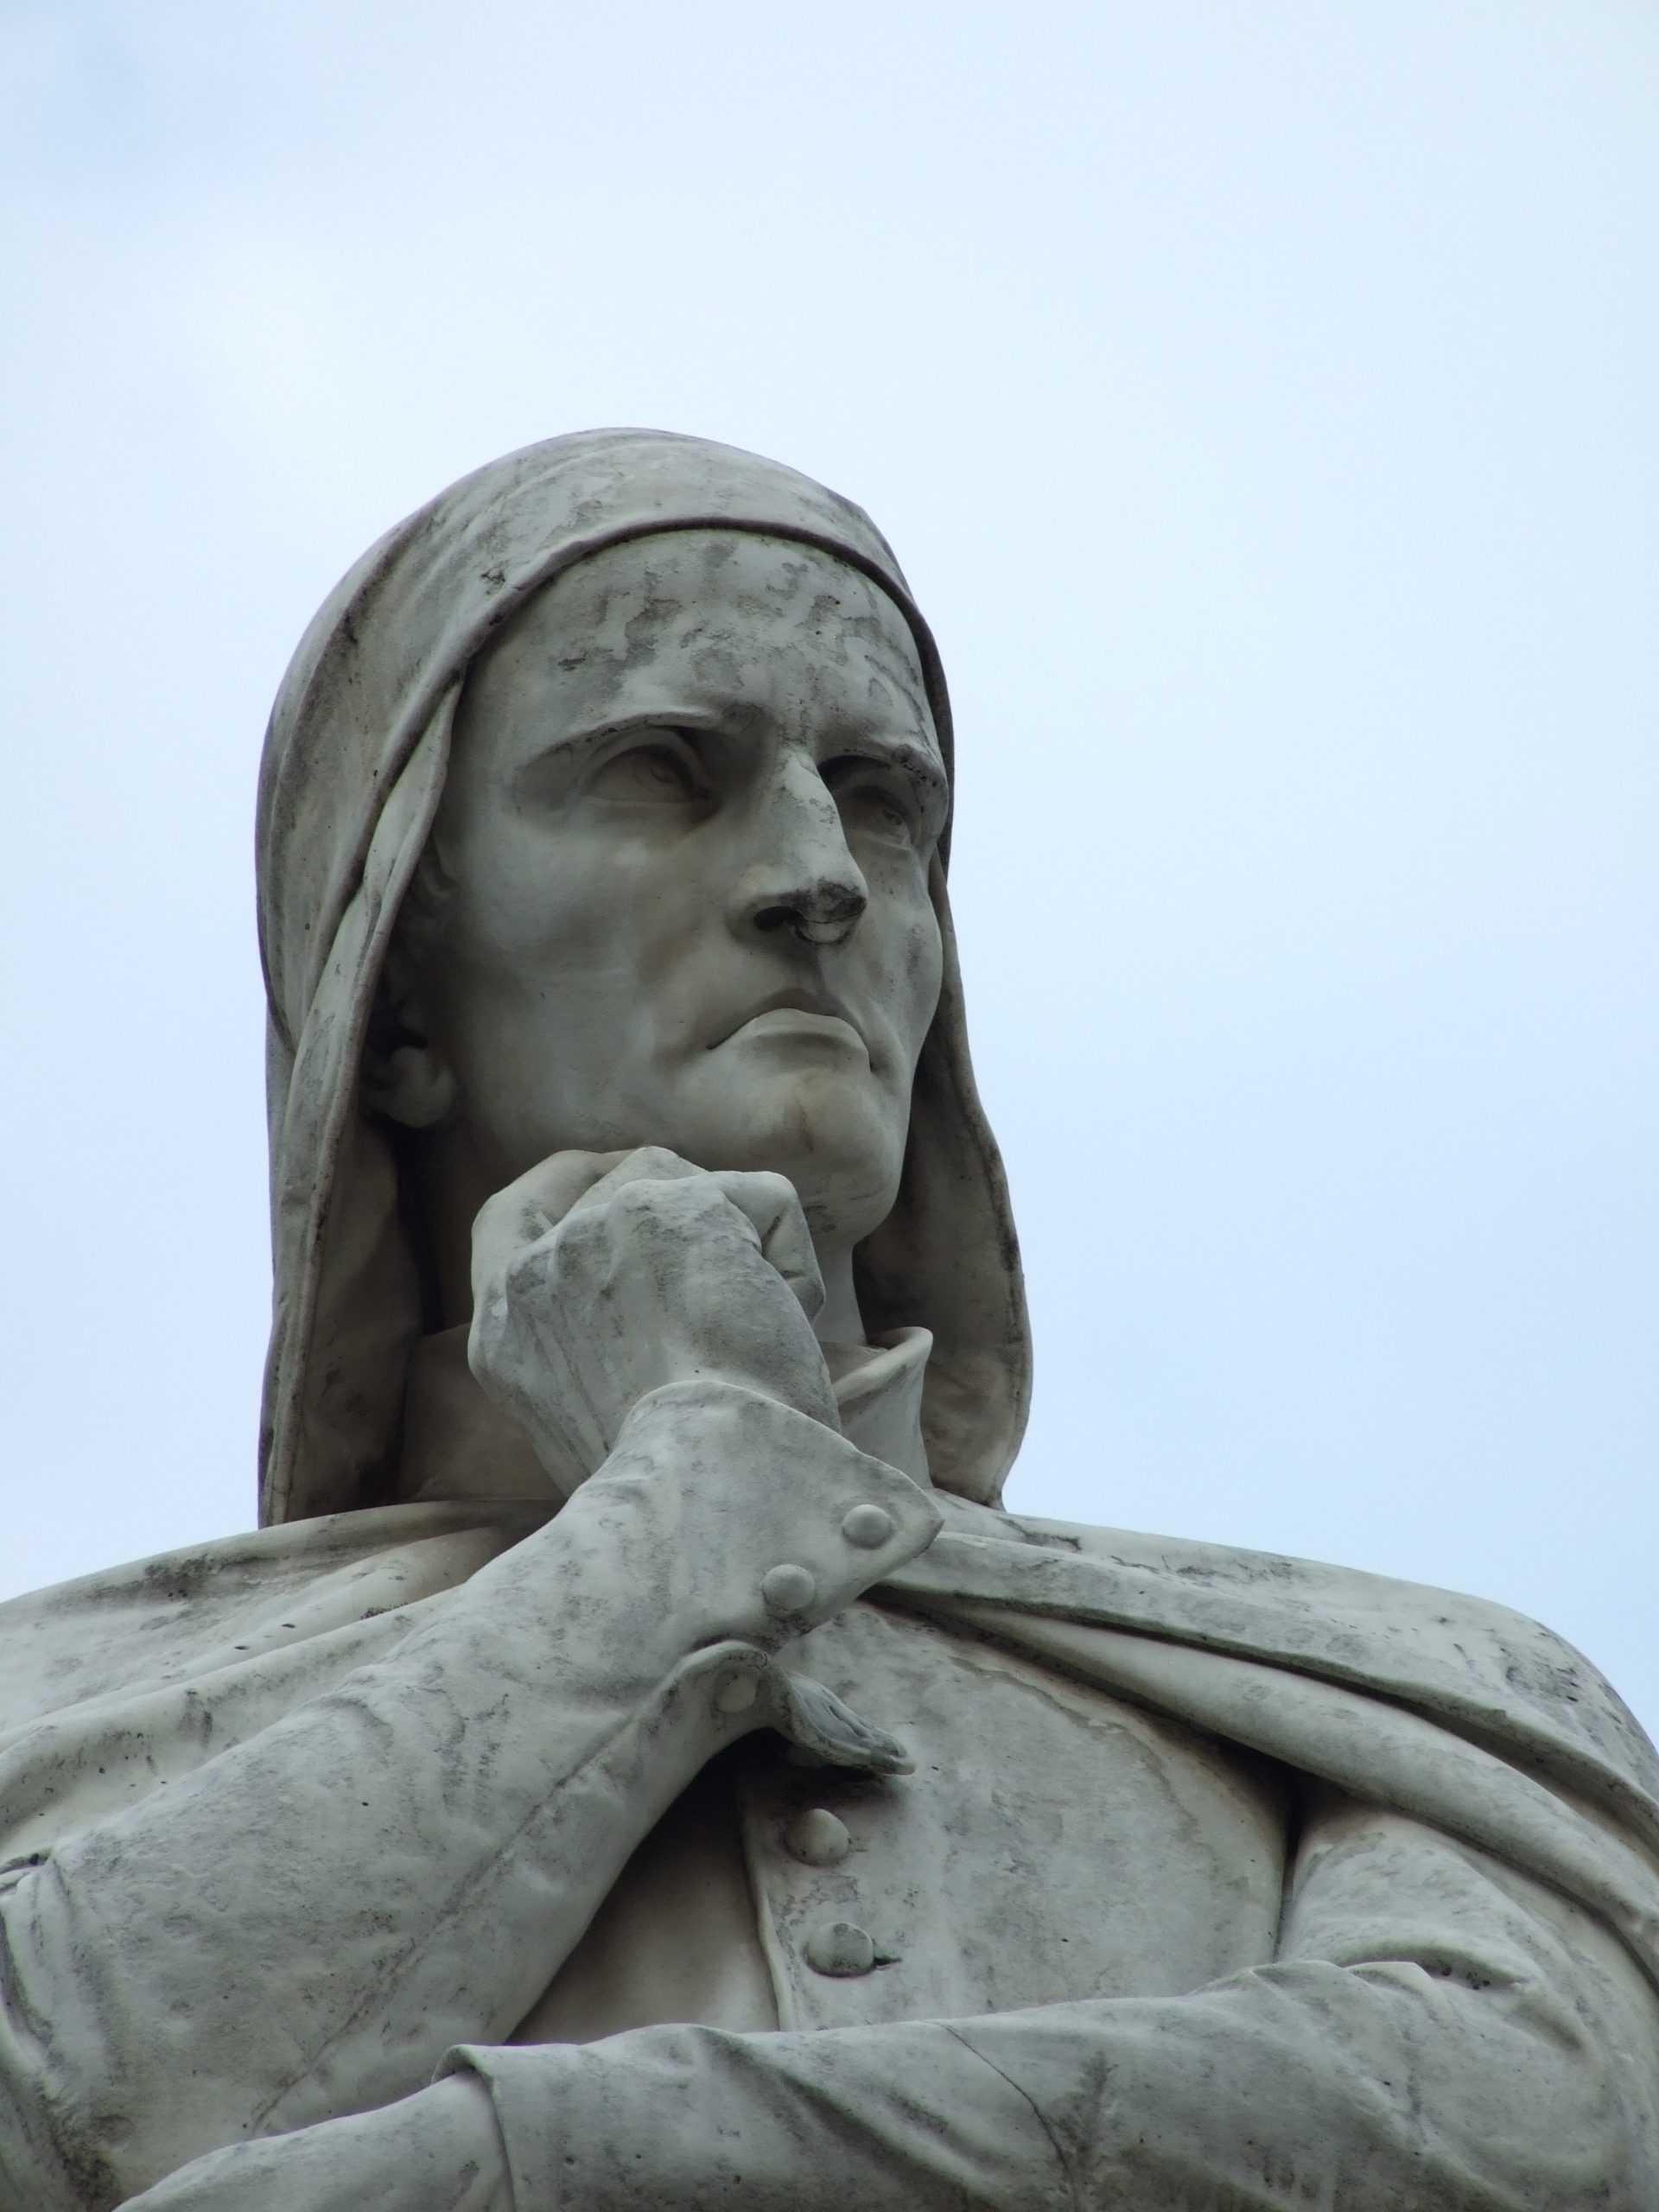 Statue Dantes in Verona